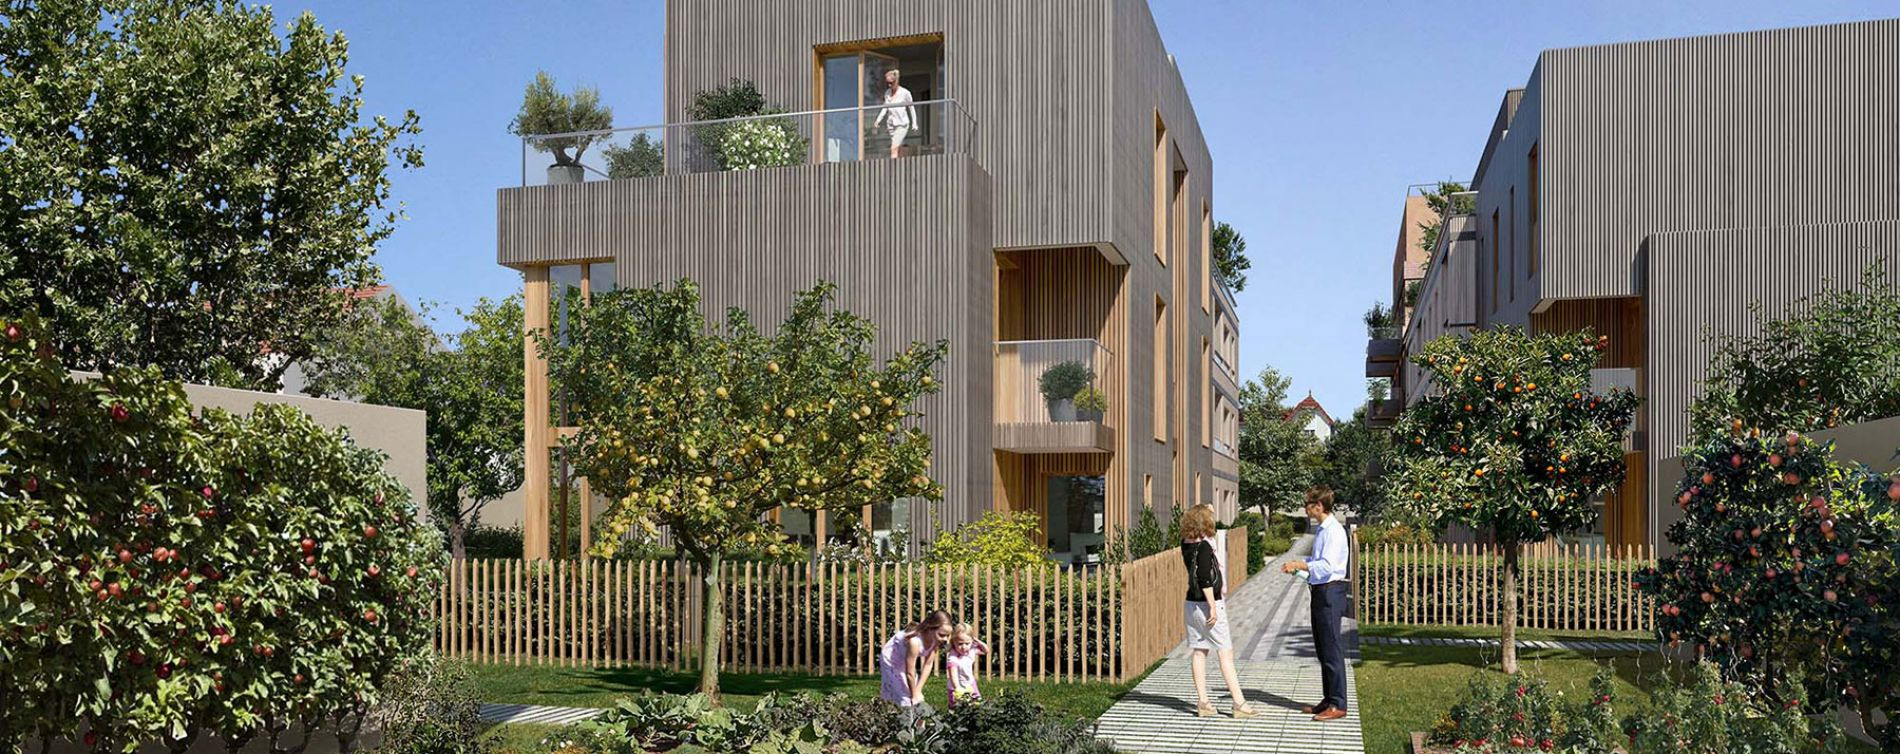 Colombes : programme immobilier neuve « Programme immobilier n°219355 » en Loi Pinel (4)